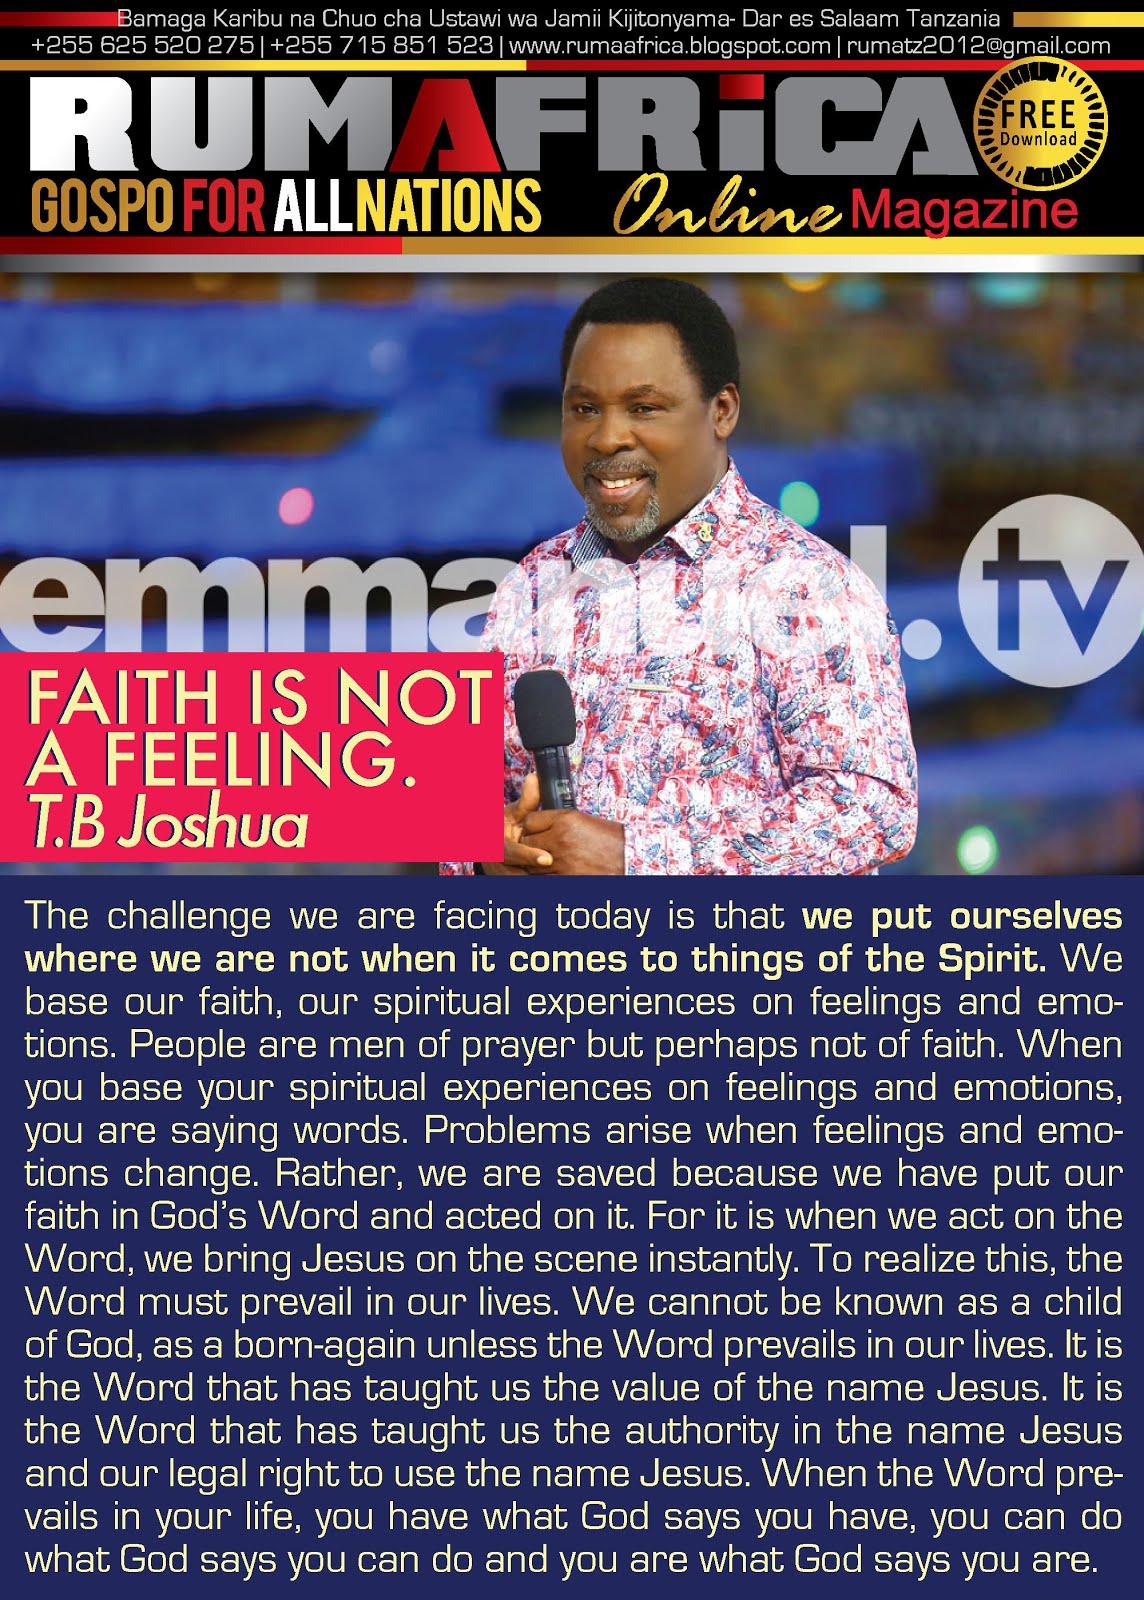 PROPHET TB JOSHUA -FAITH